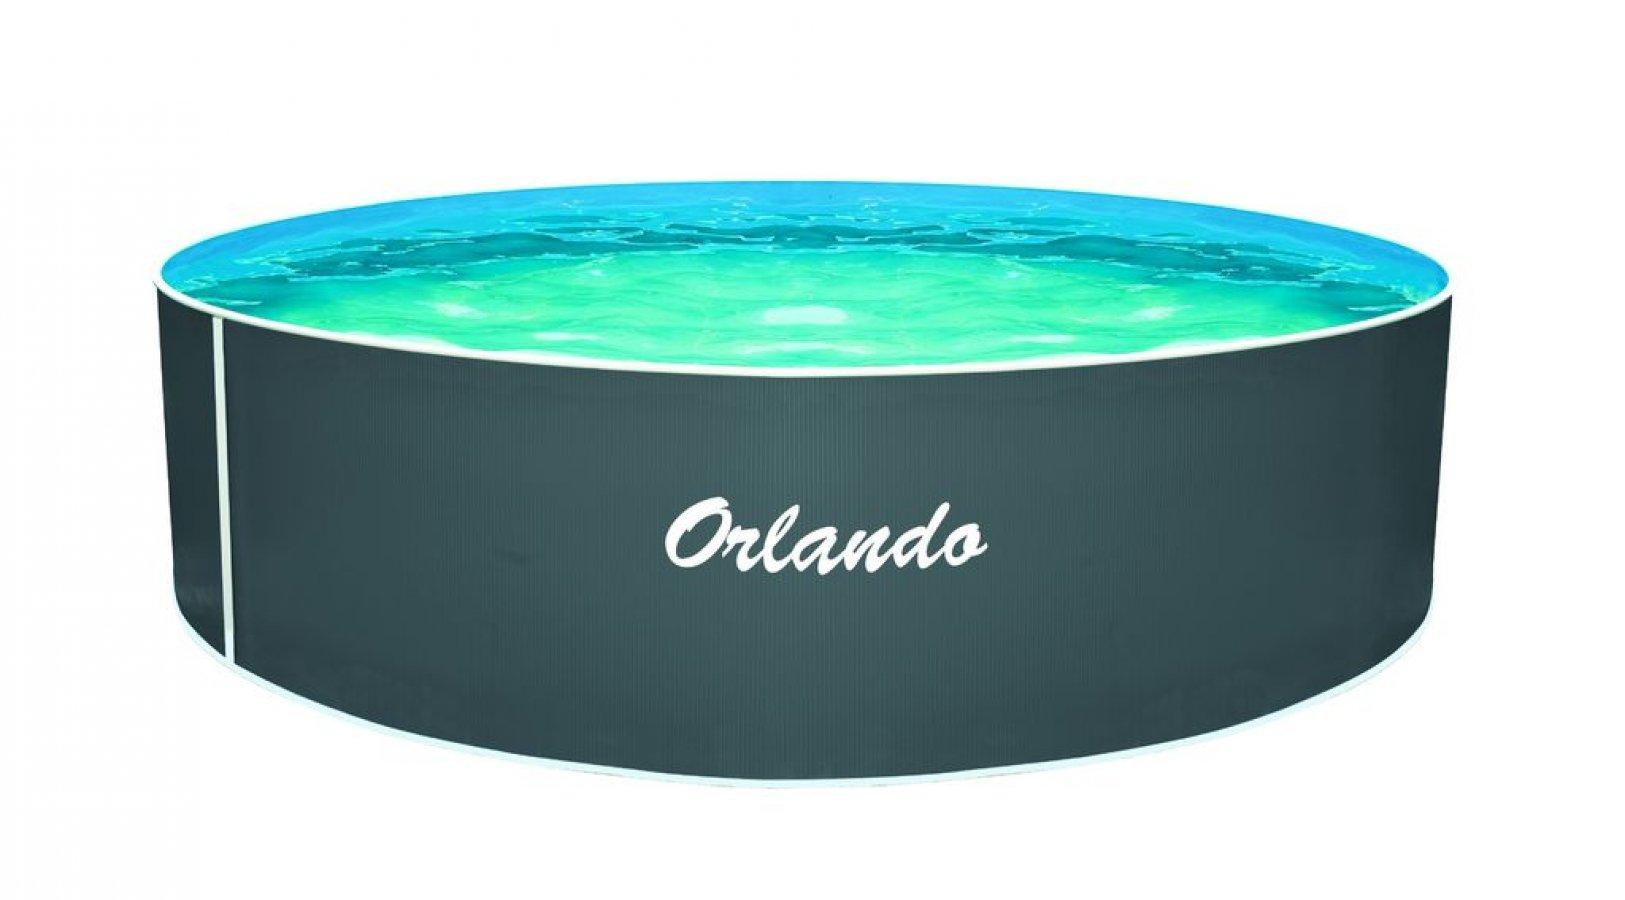 Bazén Orlando 3,66 x 1,07 - tělo bazénu + fólie